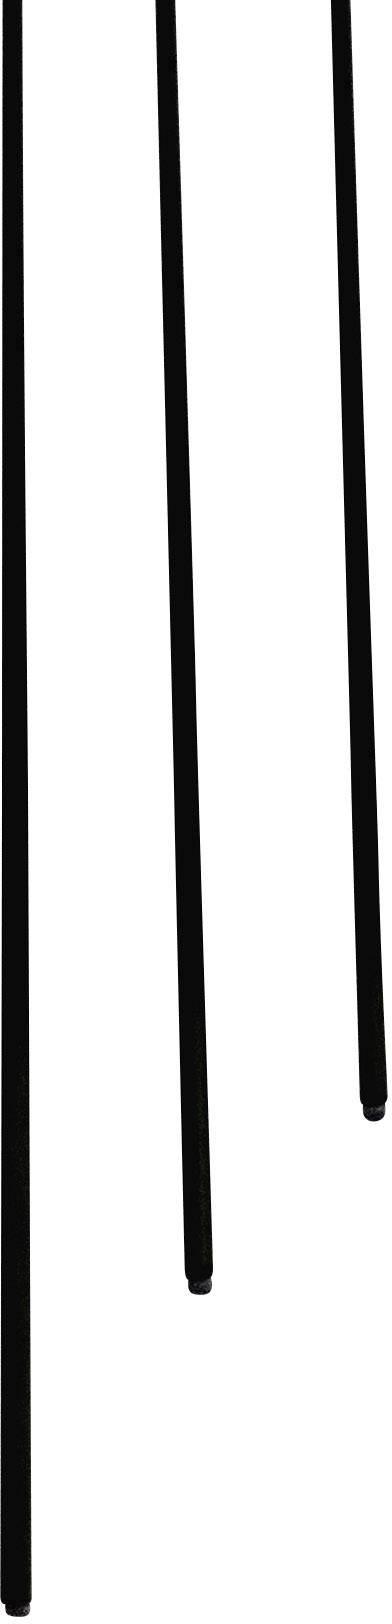 Pravouhlý profil Carbotec 236140, (d x š x v) 500 x 6 x 0.5 mm